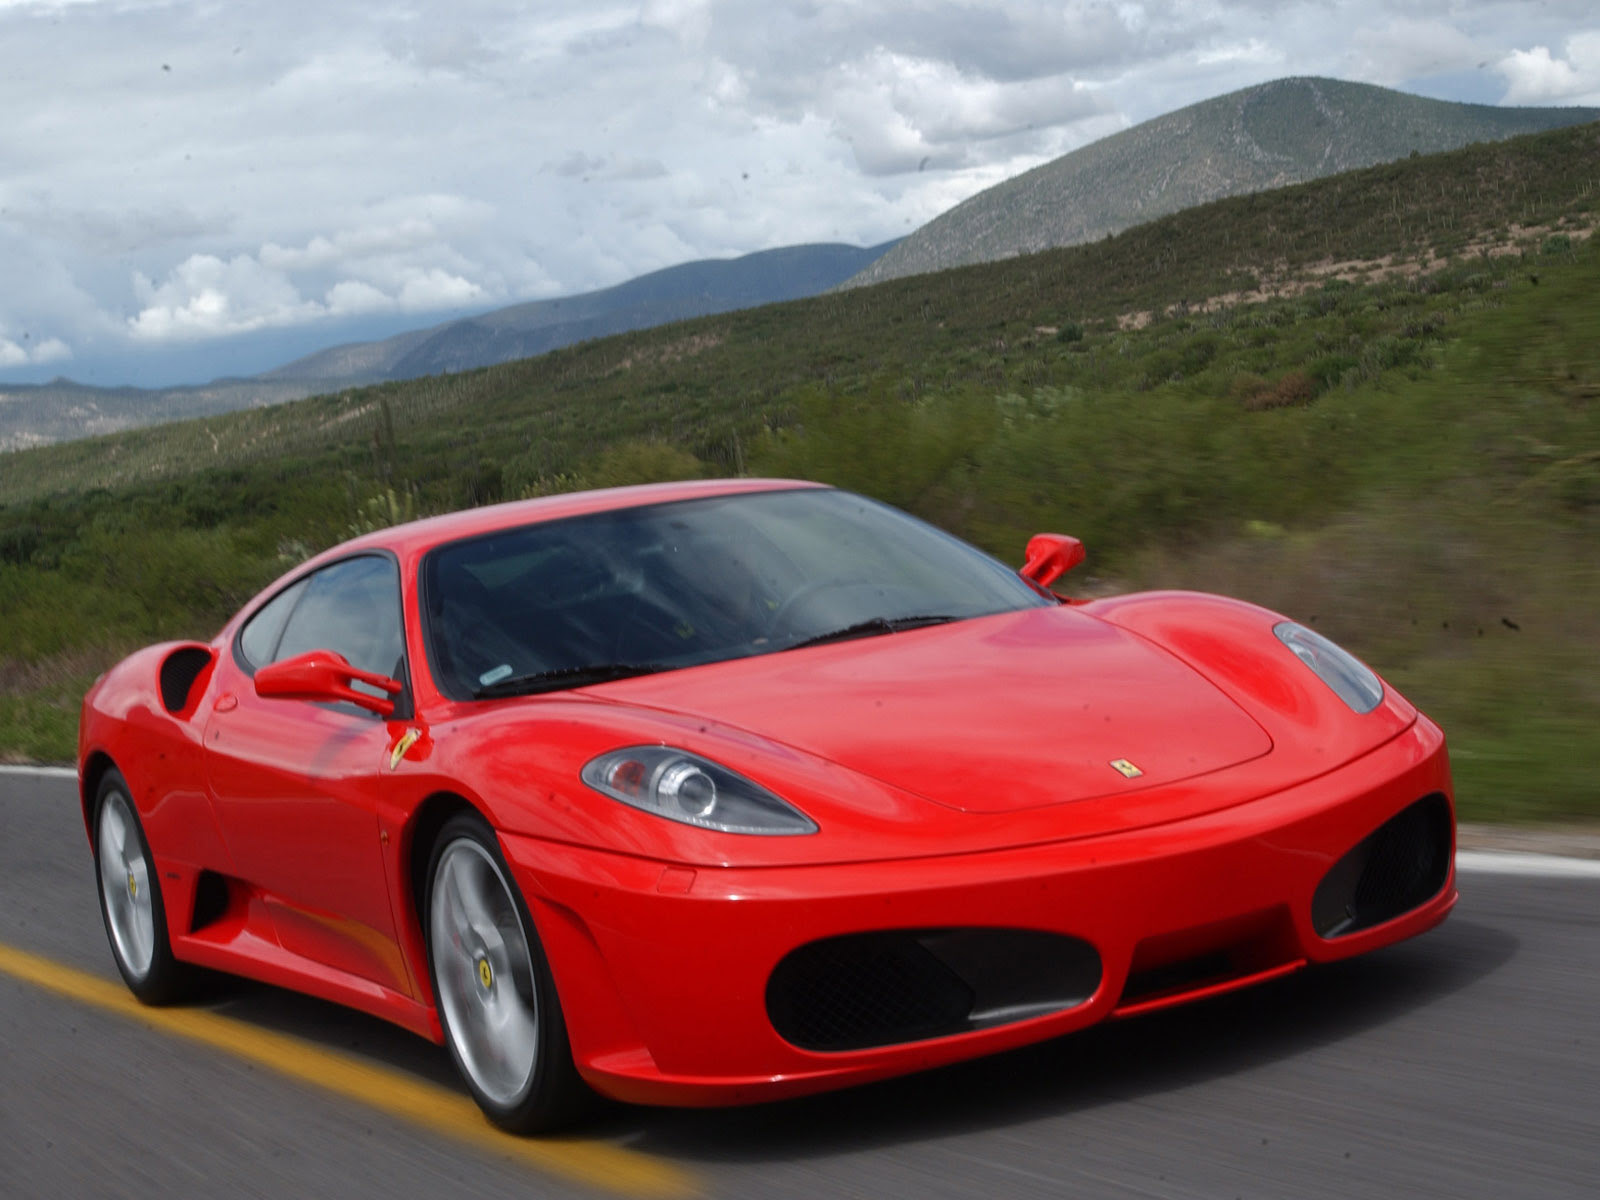 Ferrari Wallpaper 3d Wallpapers Hd